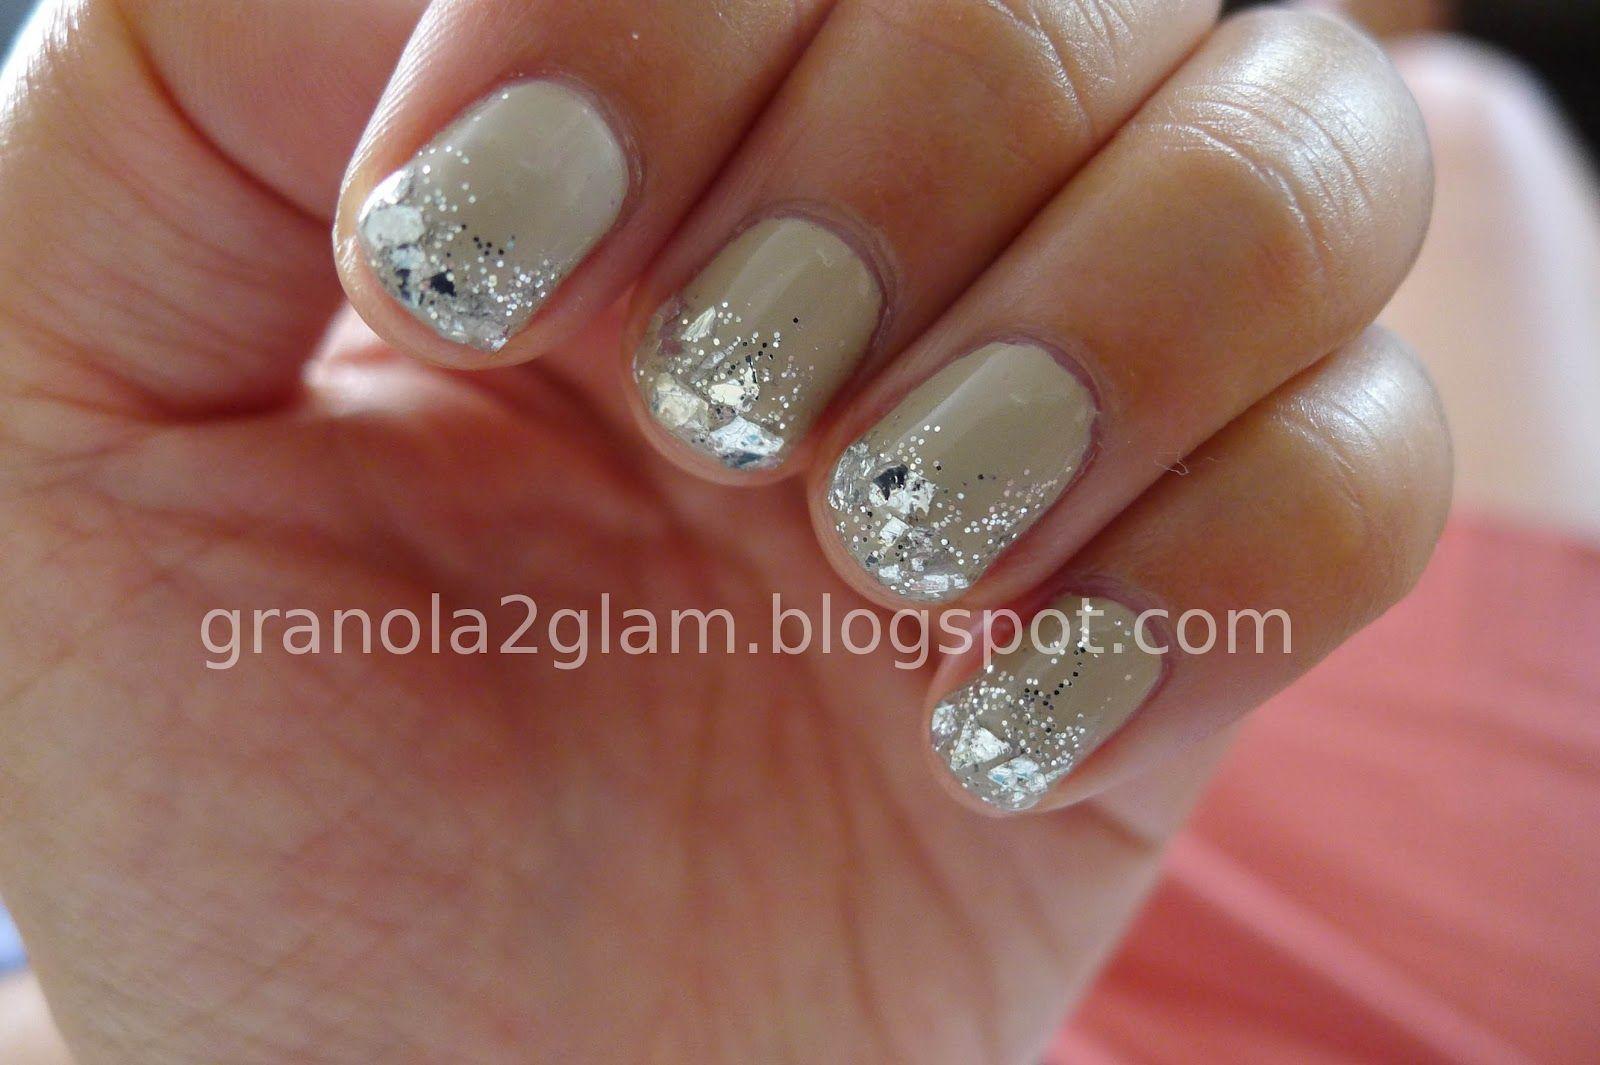 Granola 2 Glam: DIY Nude Blingy Manicure With OPI, Martha Stewart ...